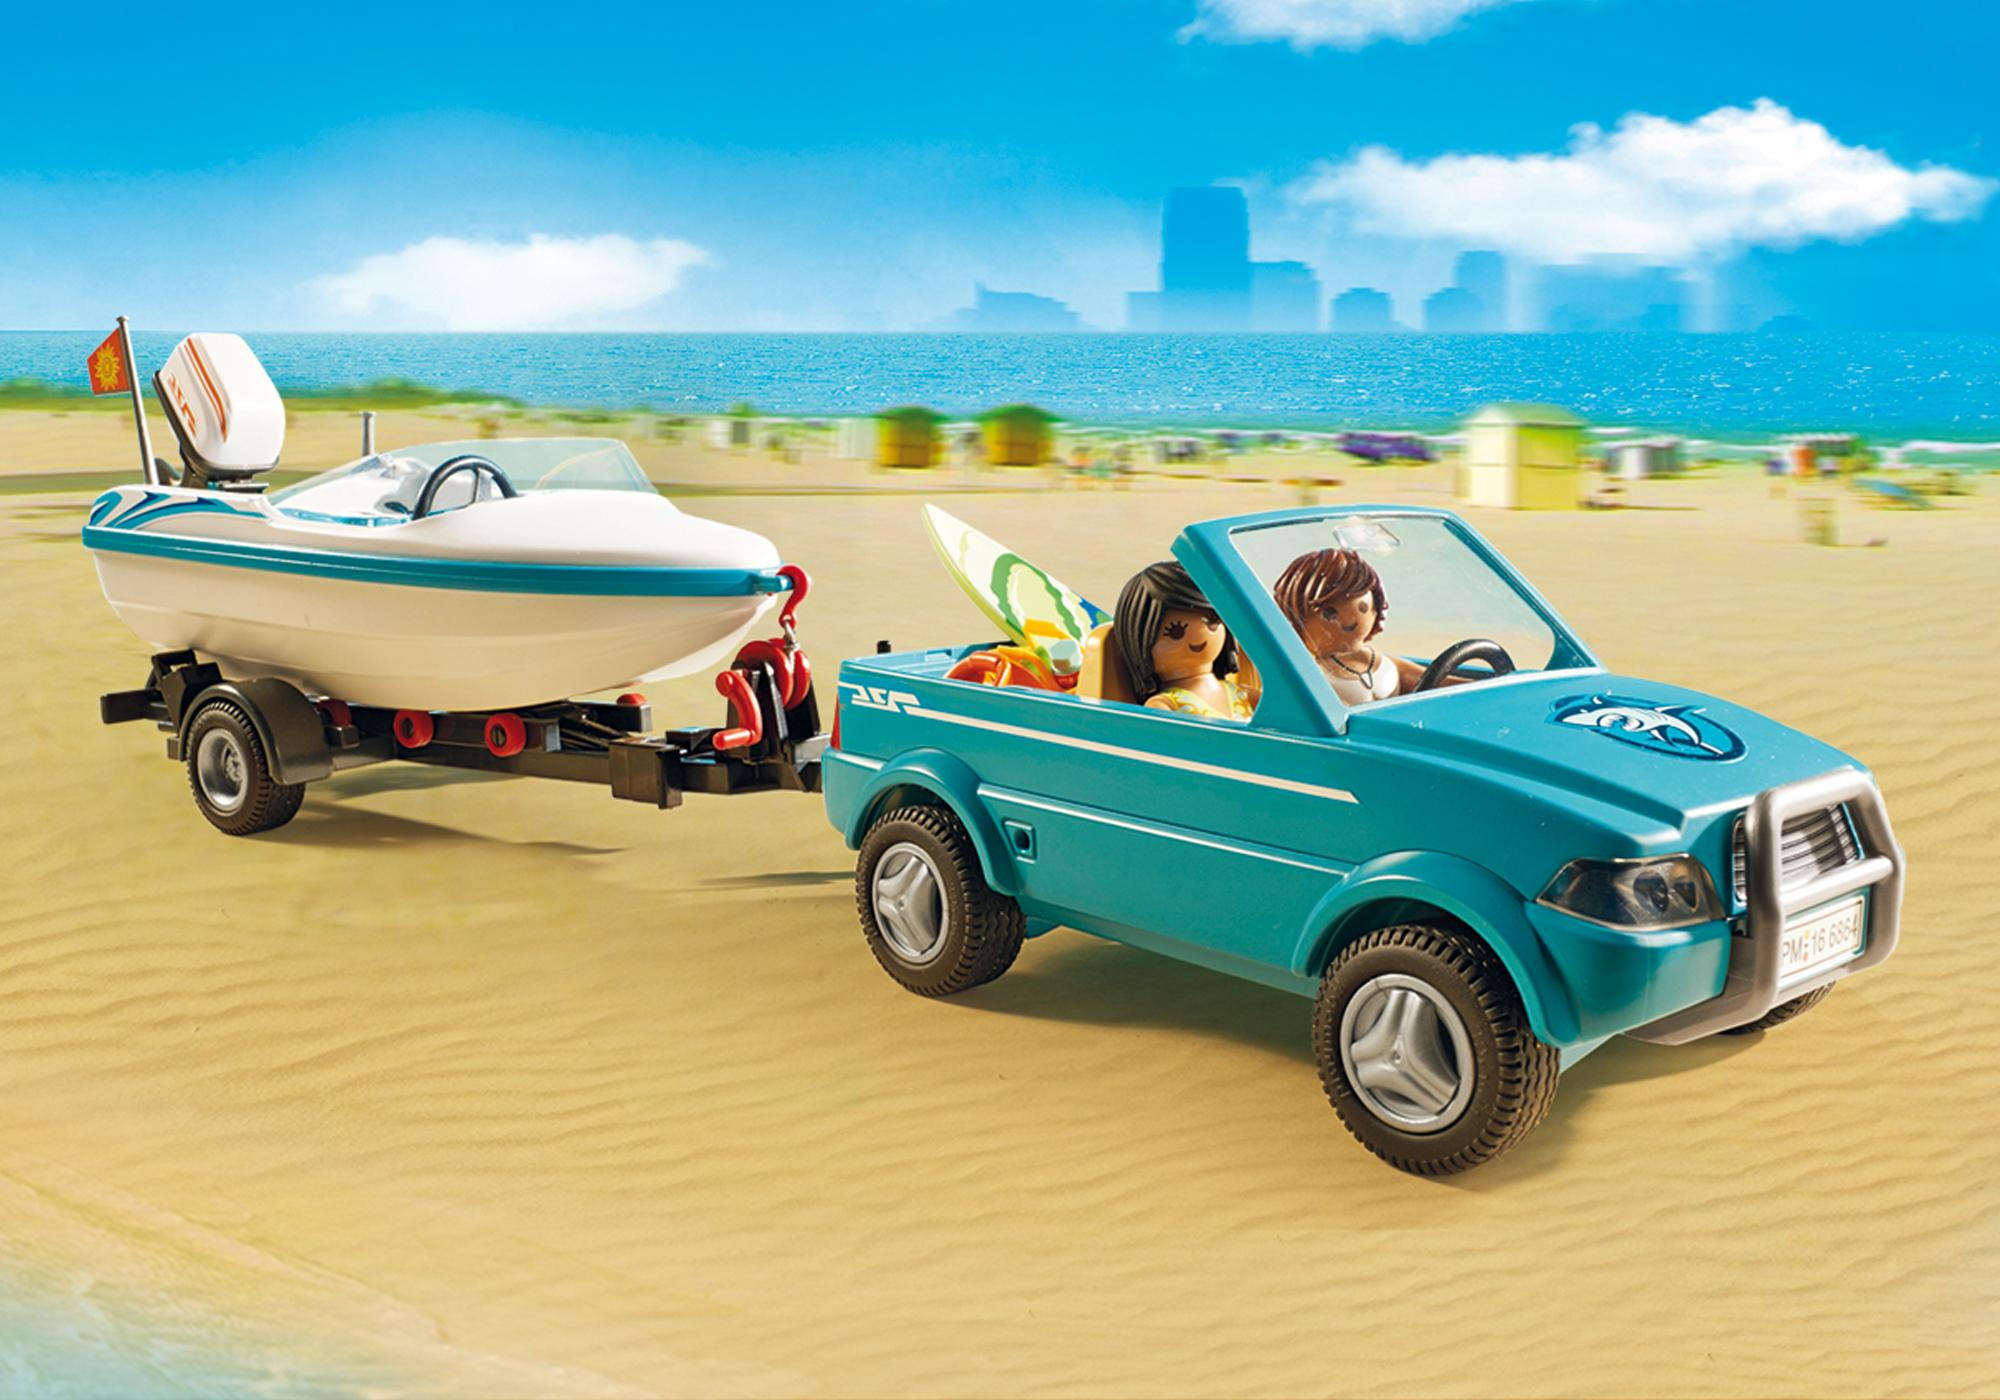 http://media.playmobil.com/i/playmobil/6864_product_extra4/Pick-up met speedboot met onderwatermotor